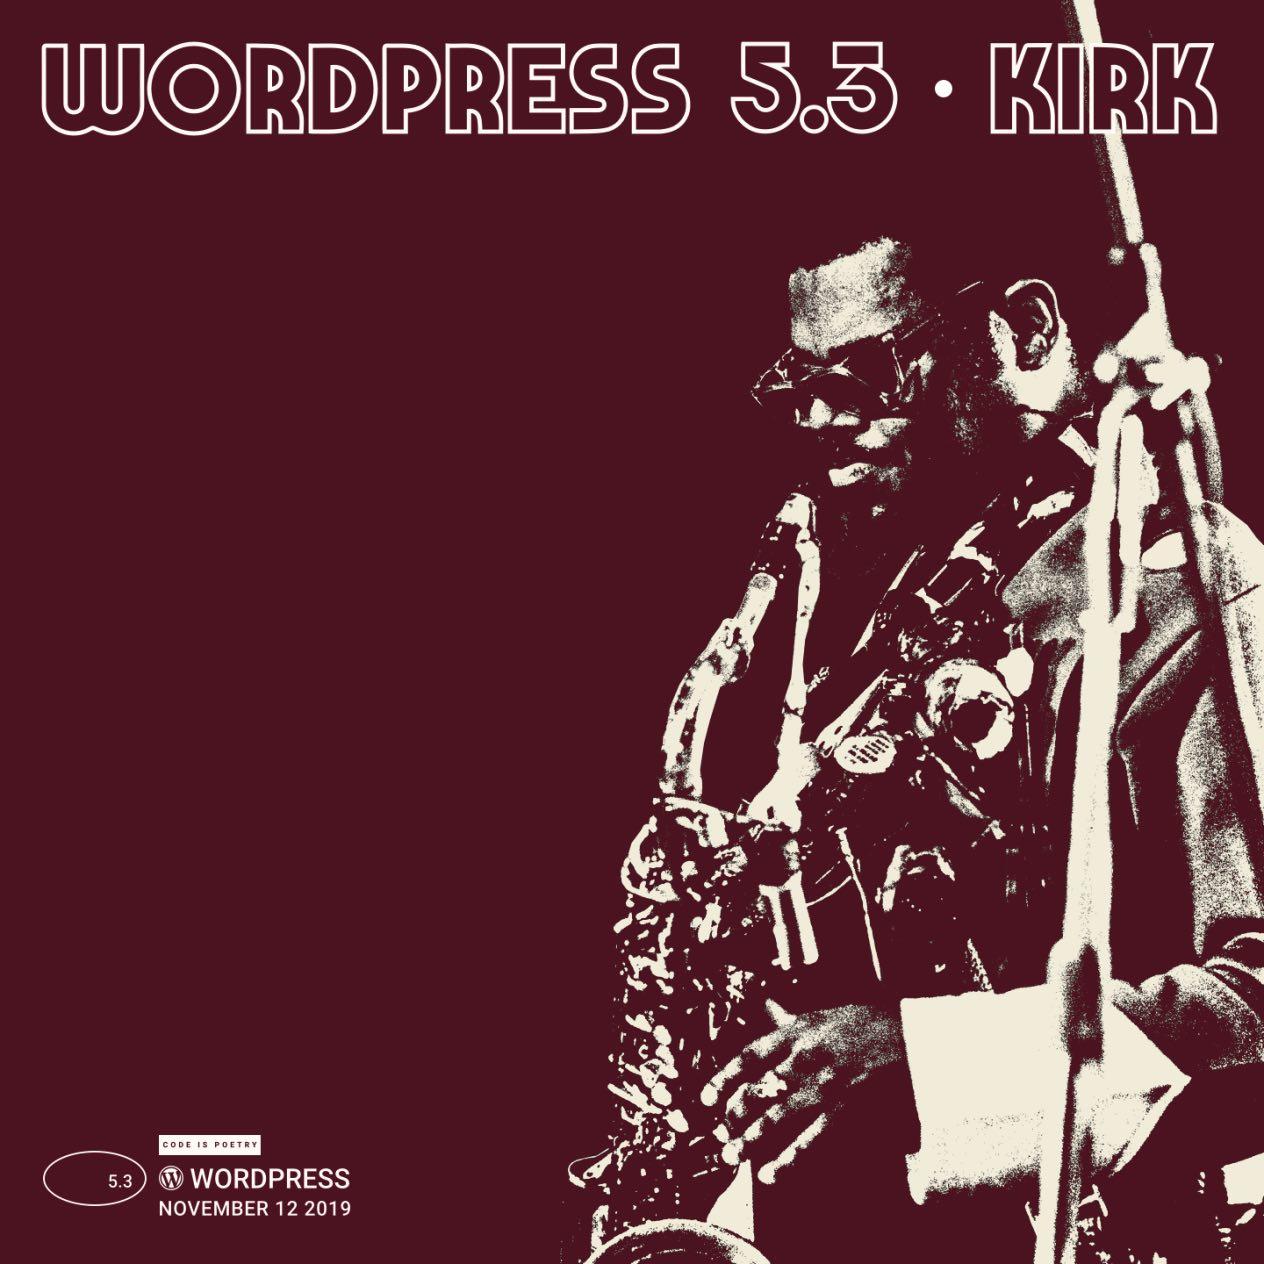 "Wordpress 5 3 ""Kirk"""